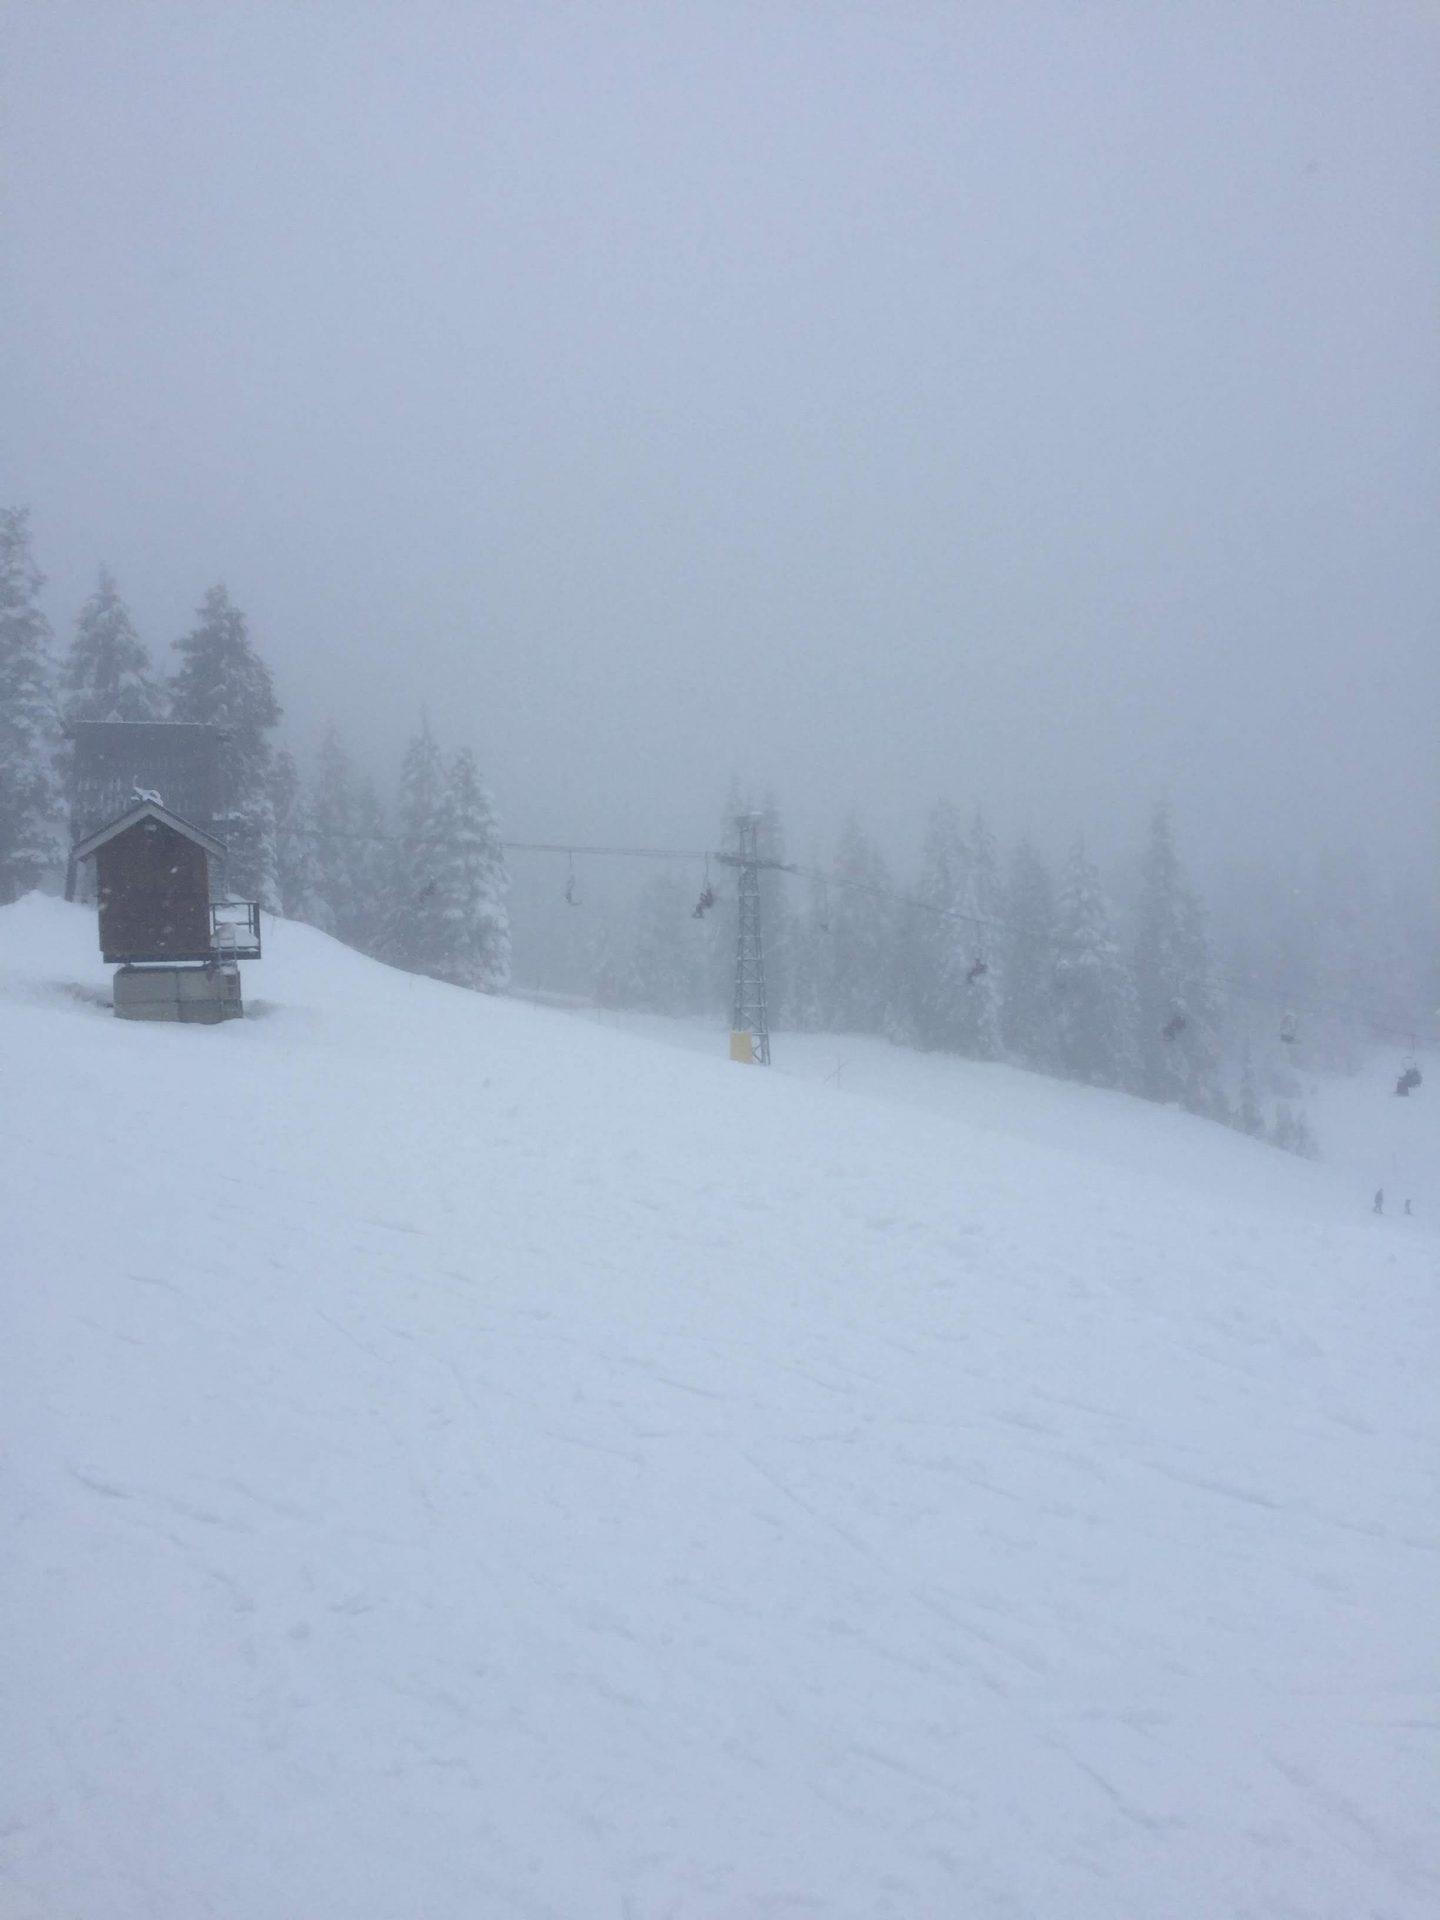 Ski lifts on Mount Seymour, Vancouver